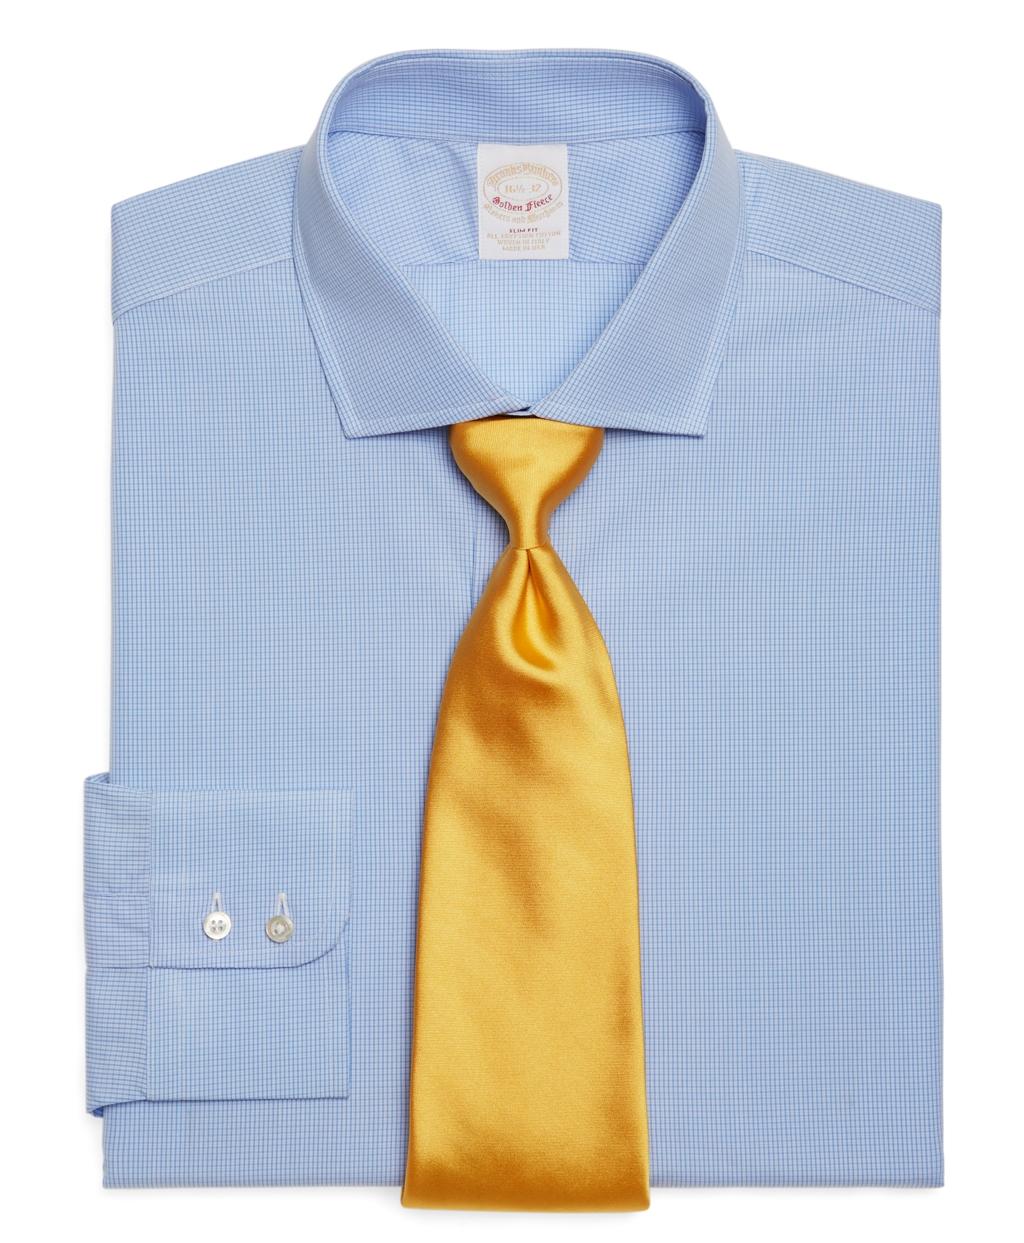 Brooks brothers golden fleece allcotton slim fit fine Brooks brothers shirt size guide